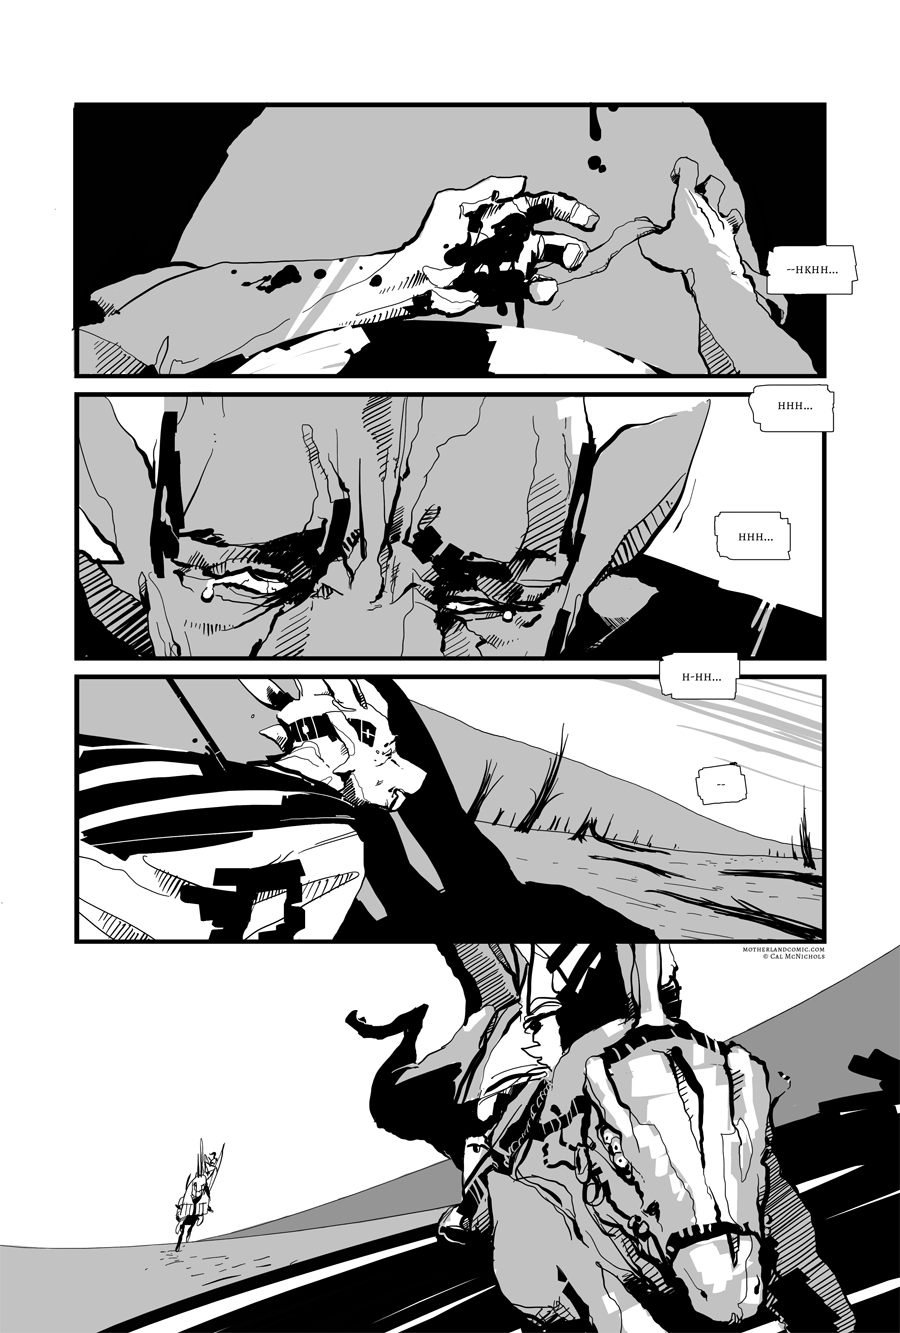 pg 47